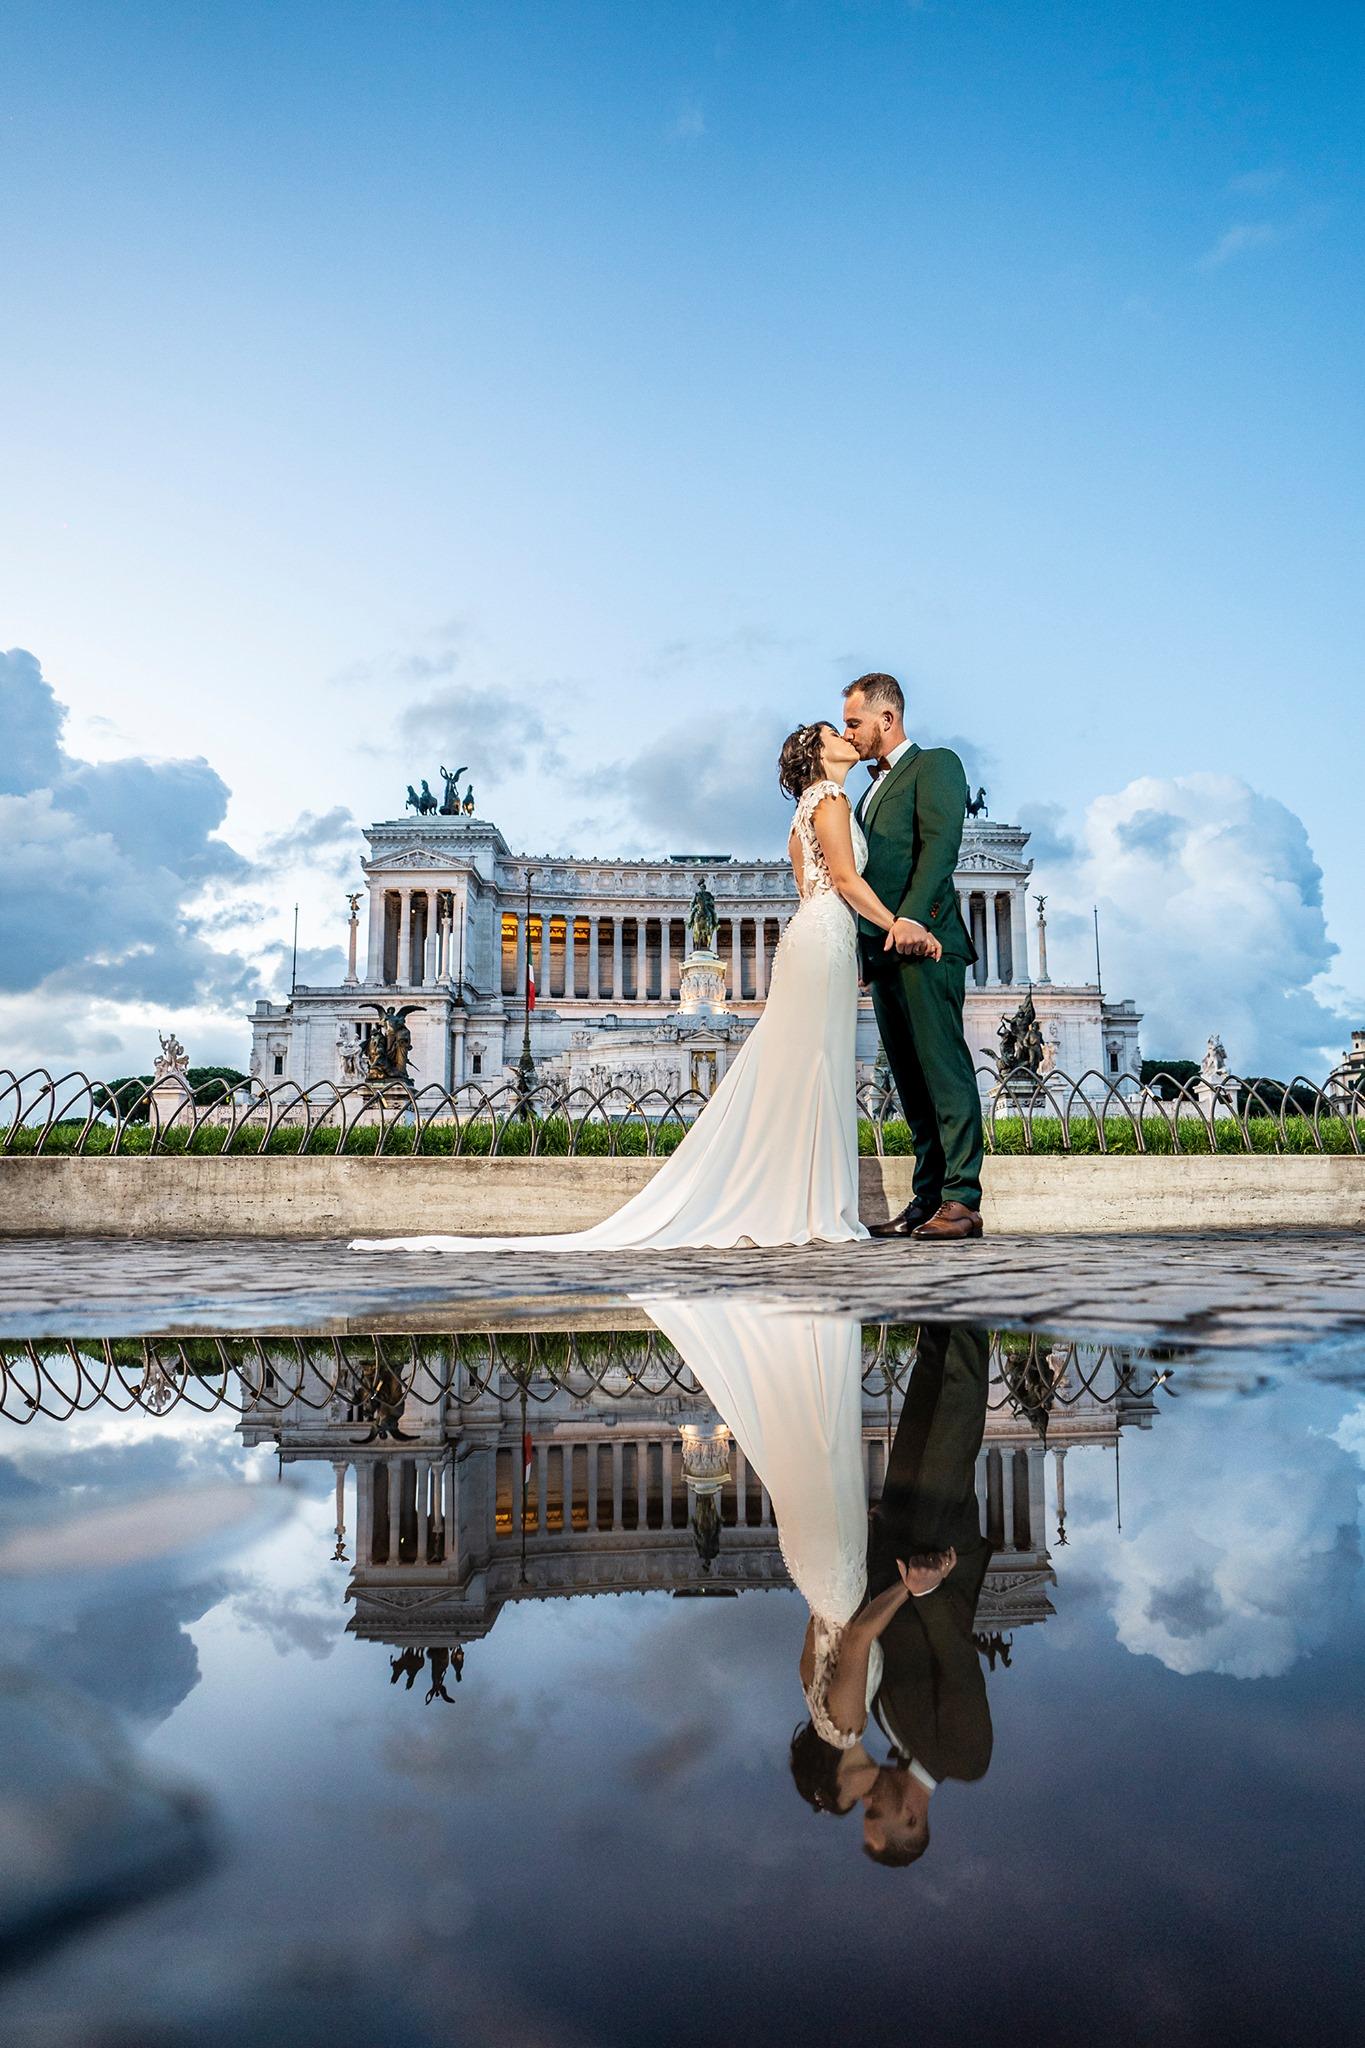 Mariage, Rome, Italie